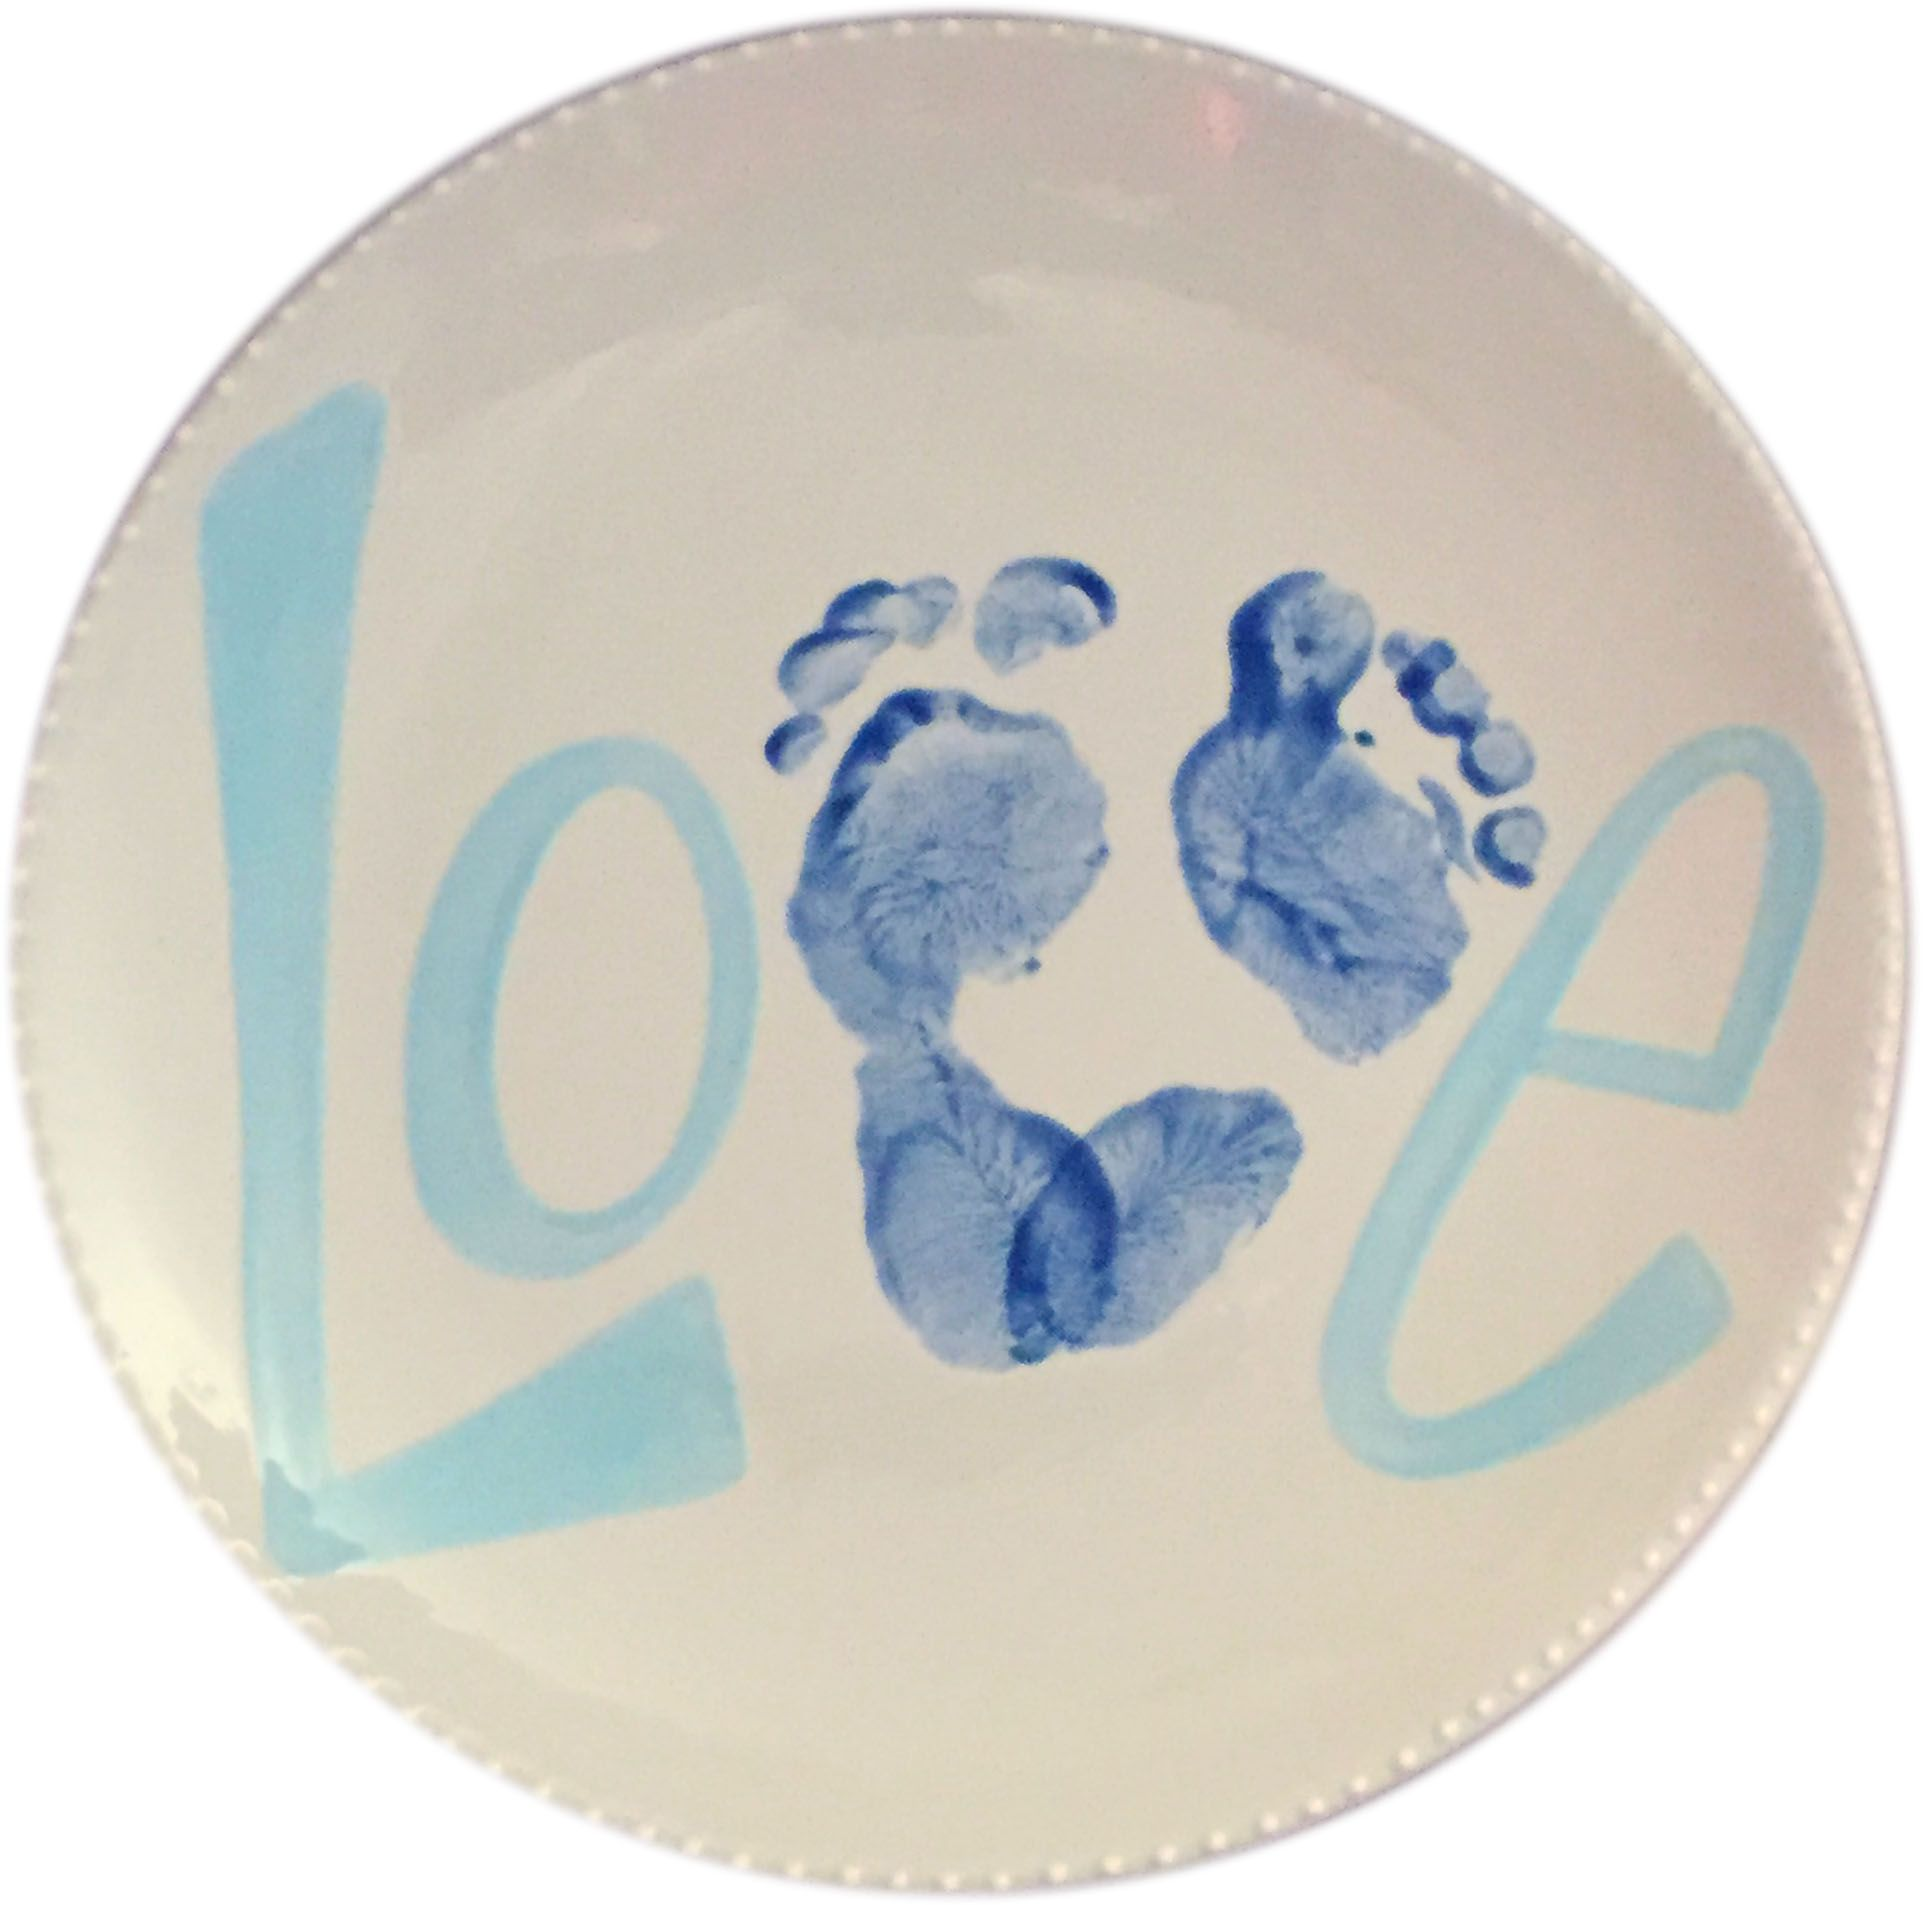 Love round footprint plate brush strokes pottery for Handprint ceramic plate ideas